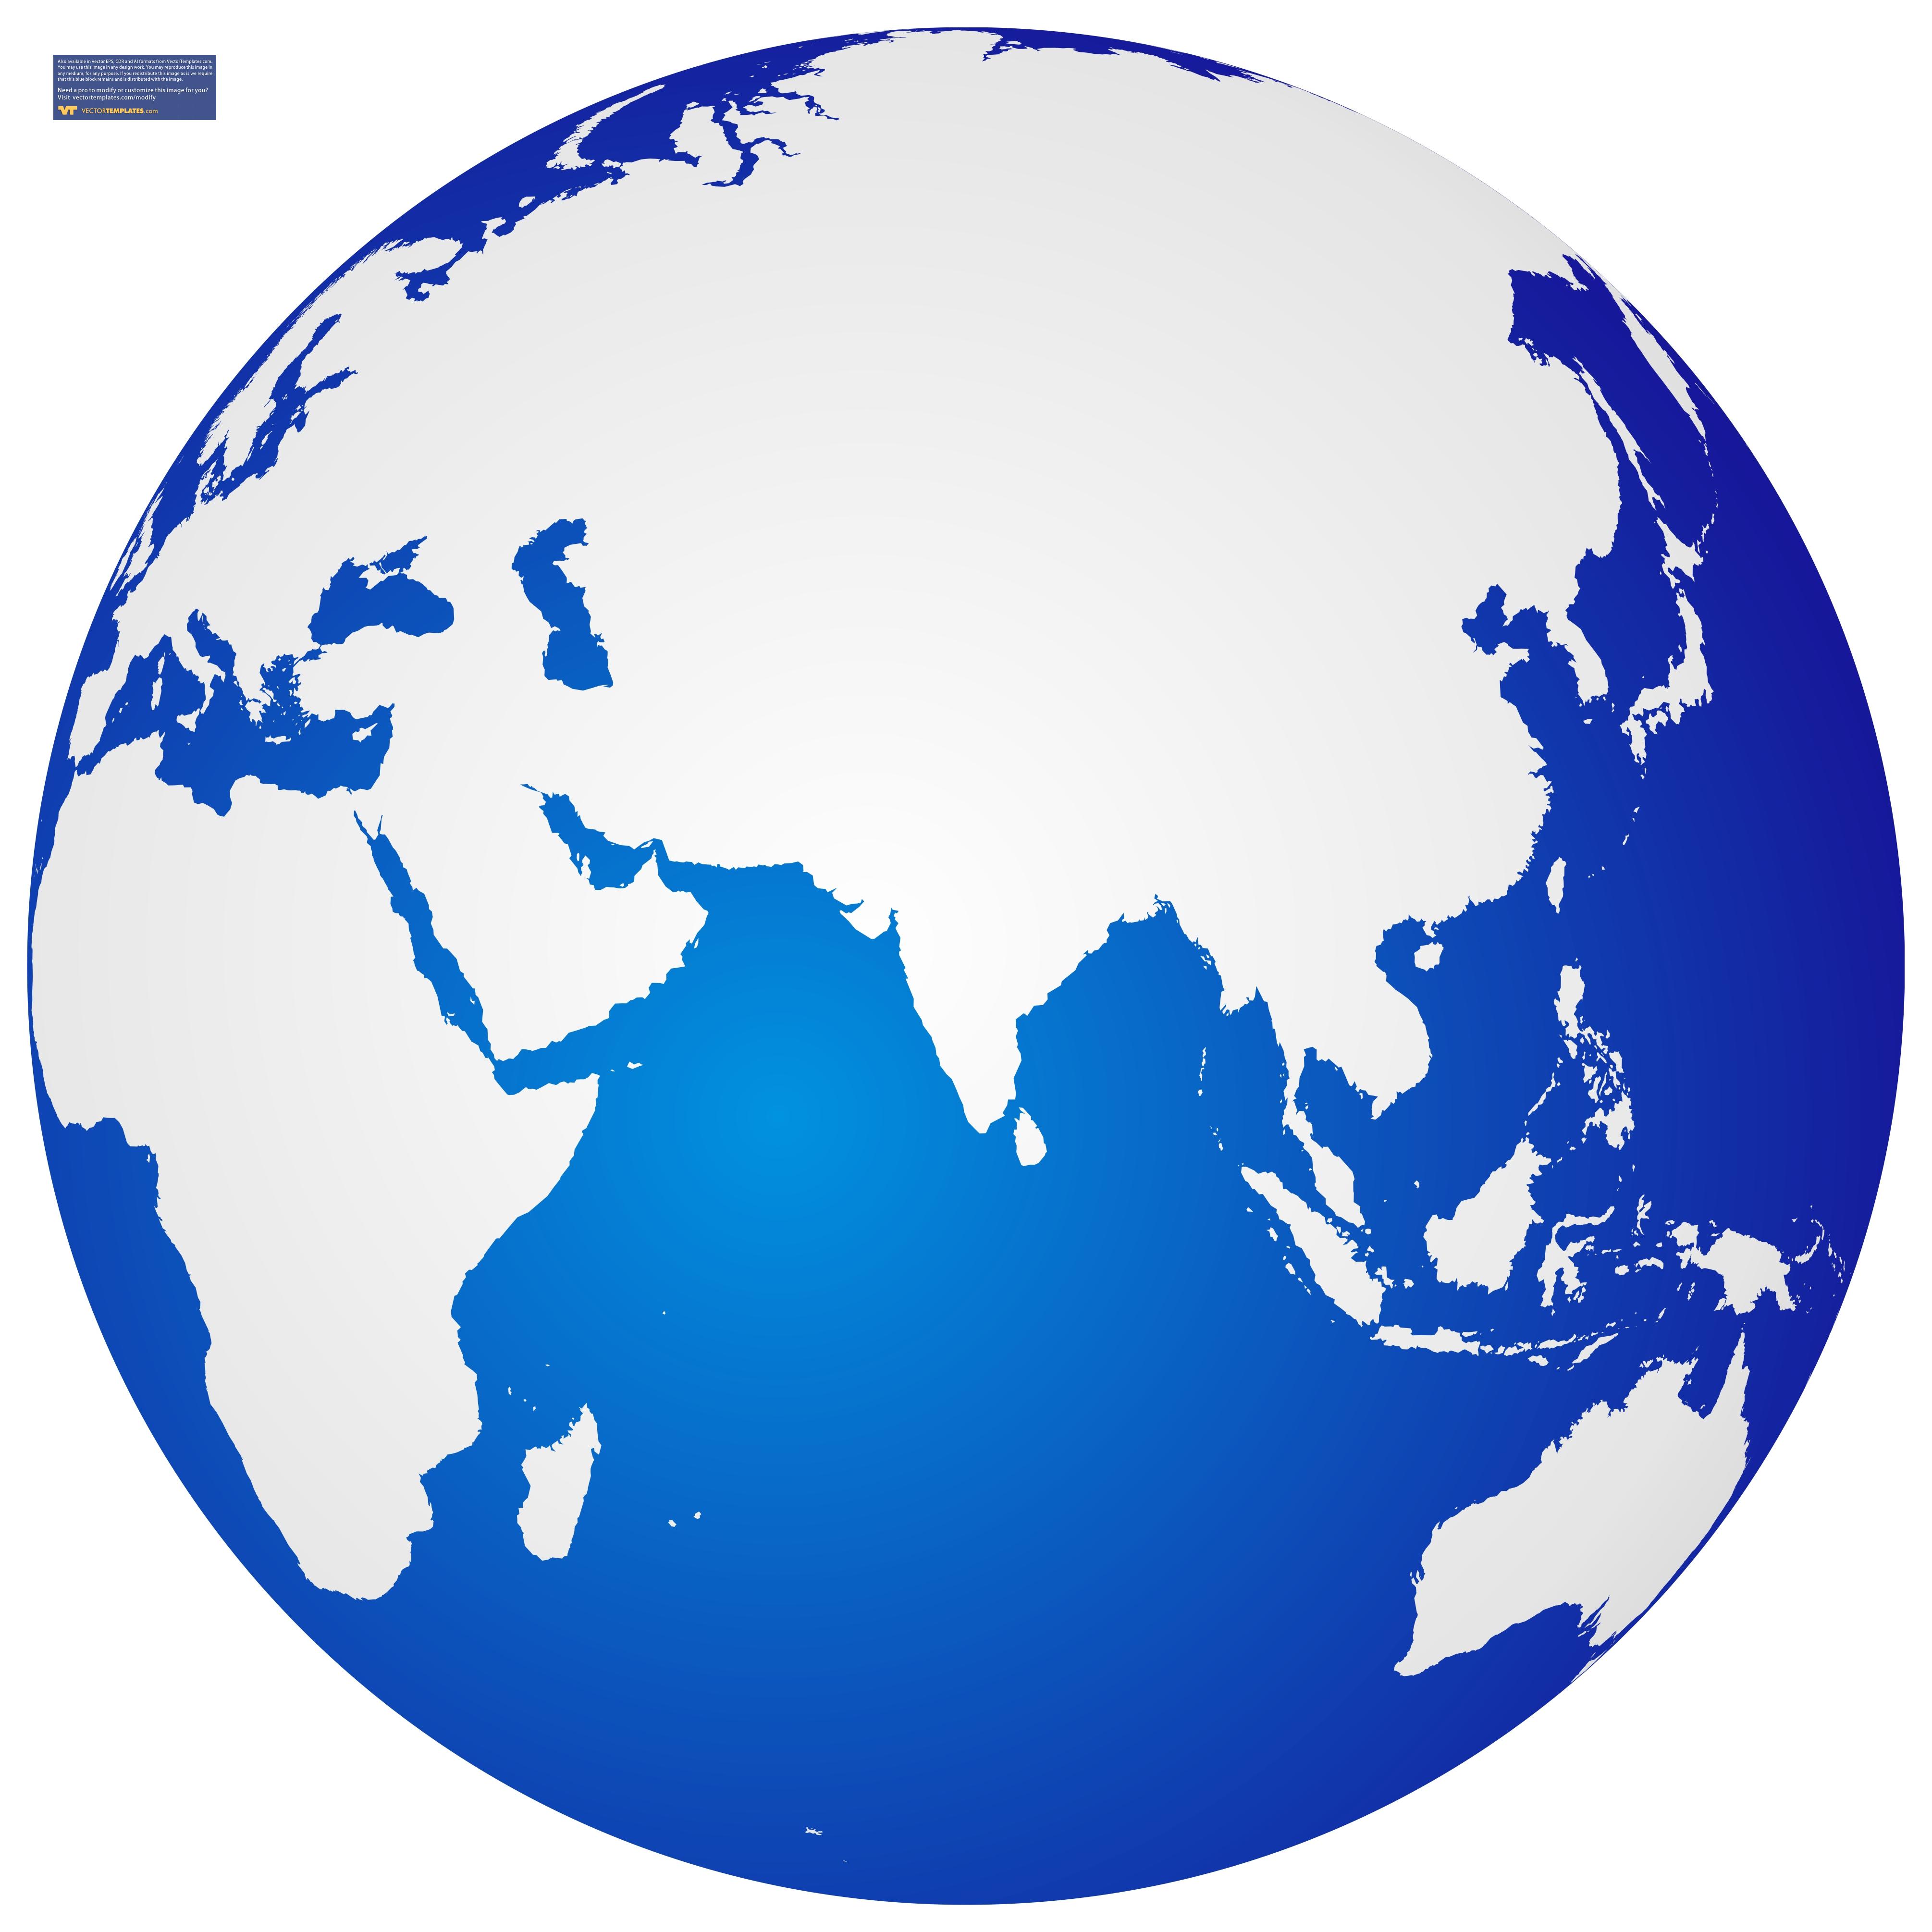 Logo clipart earth Clipart Panda Free Black Images